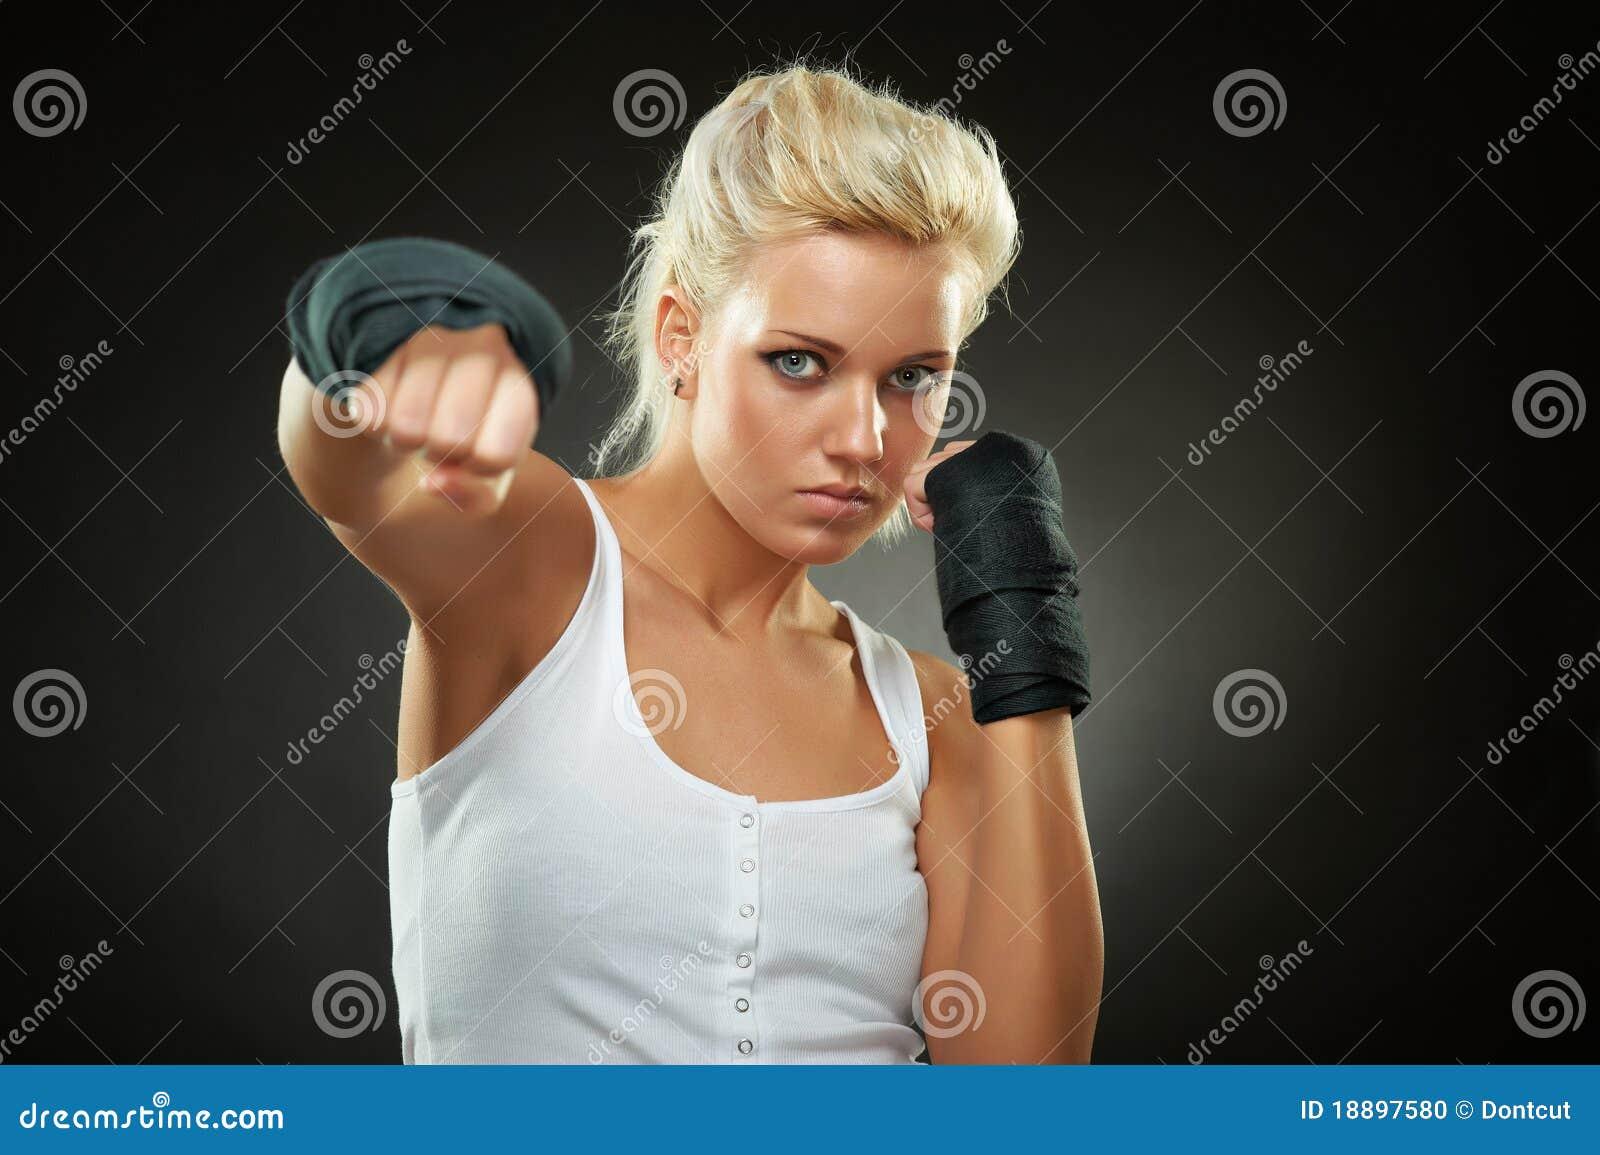 Самооборона для девушки фото